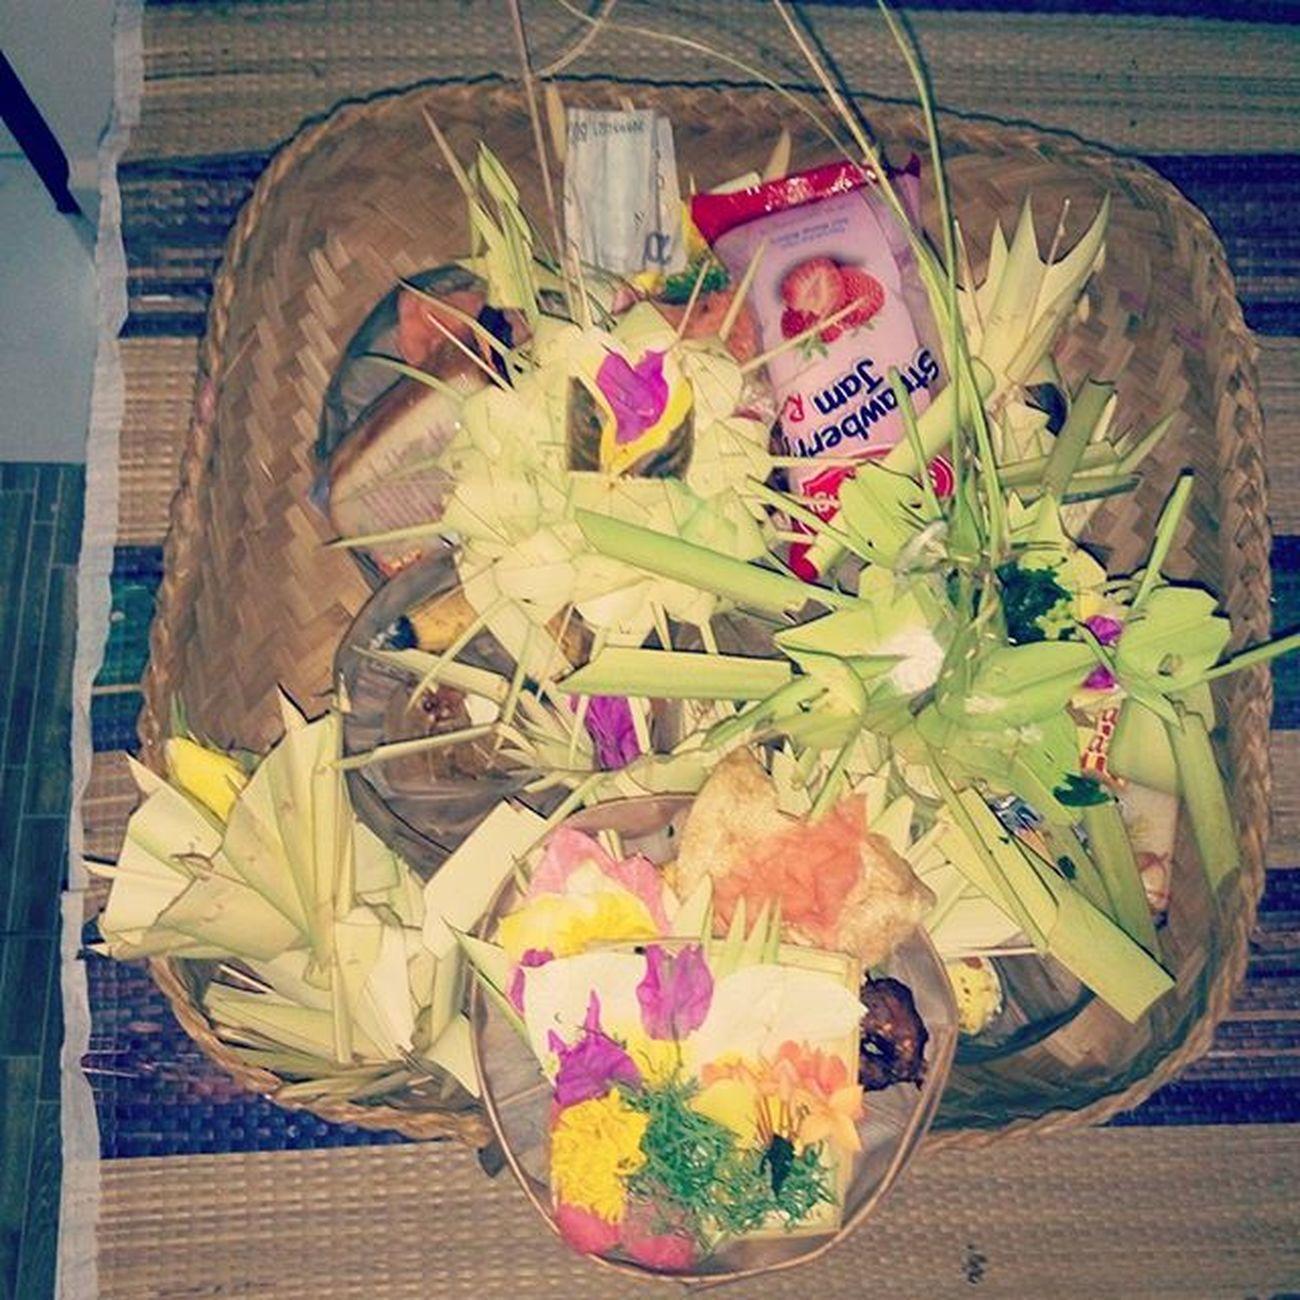 Mewat kawat mebalung besi... Balinesebirthdayceremony a.k.a Otonan